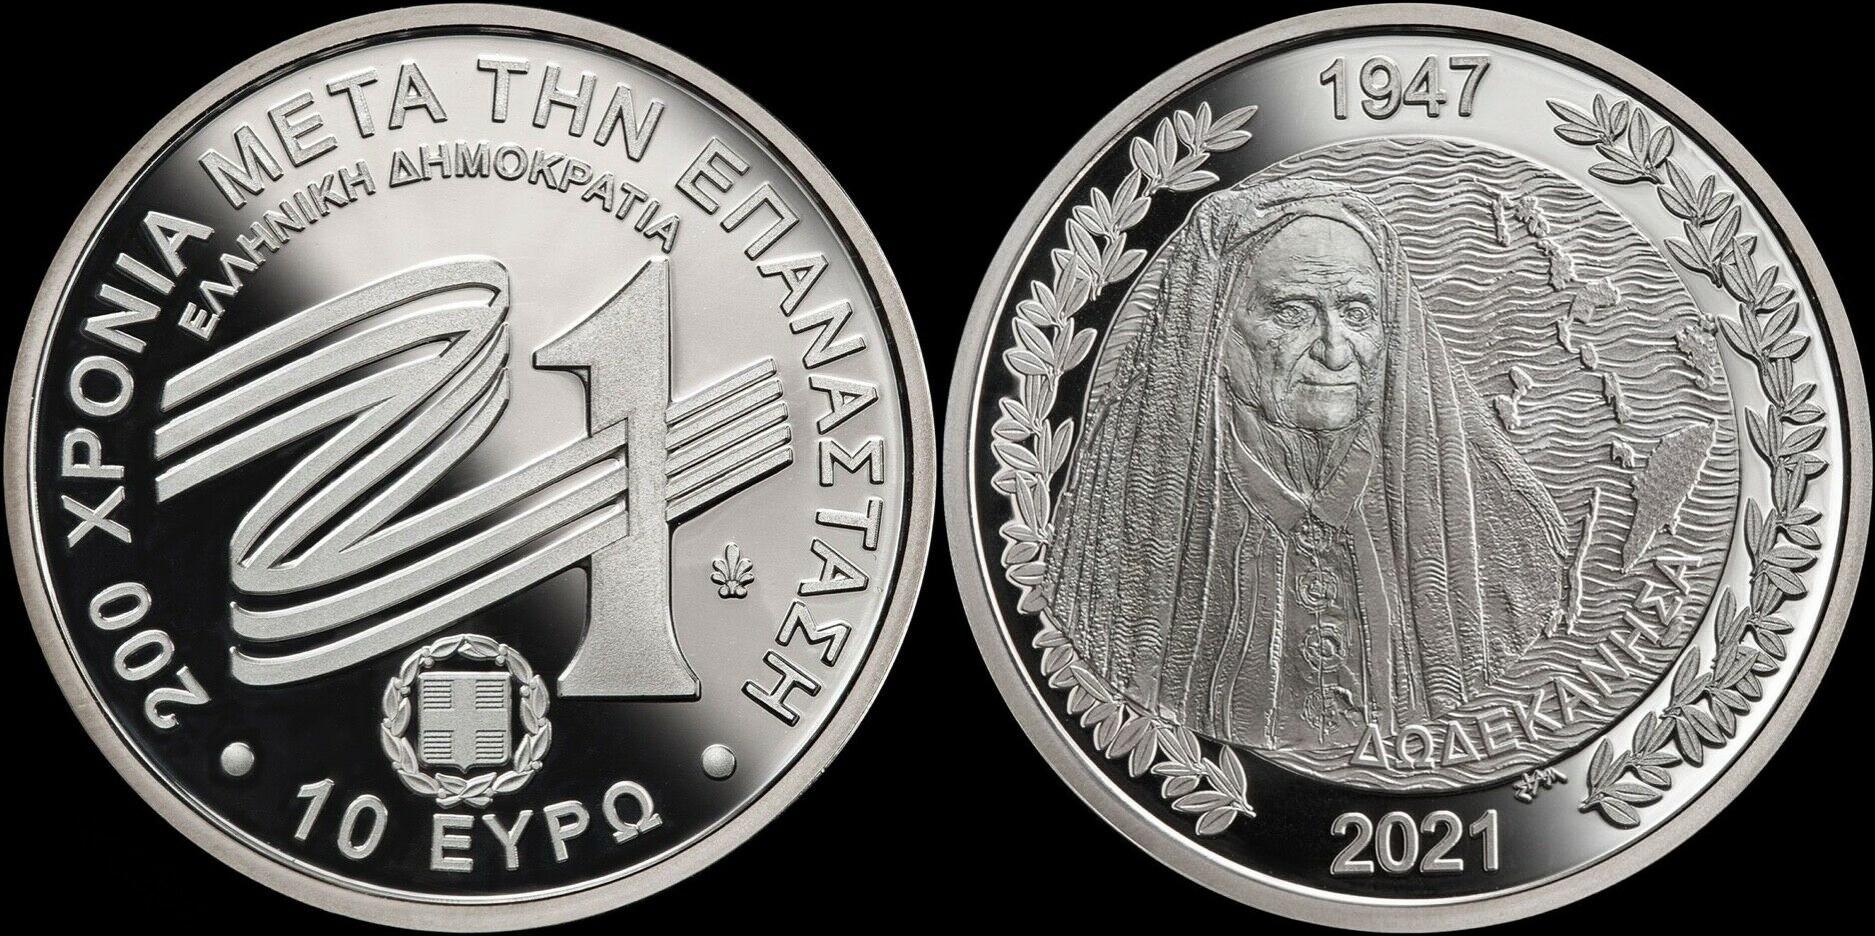 grece-2021-integration-des-iles-dodecanese